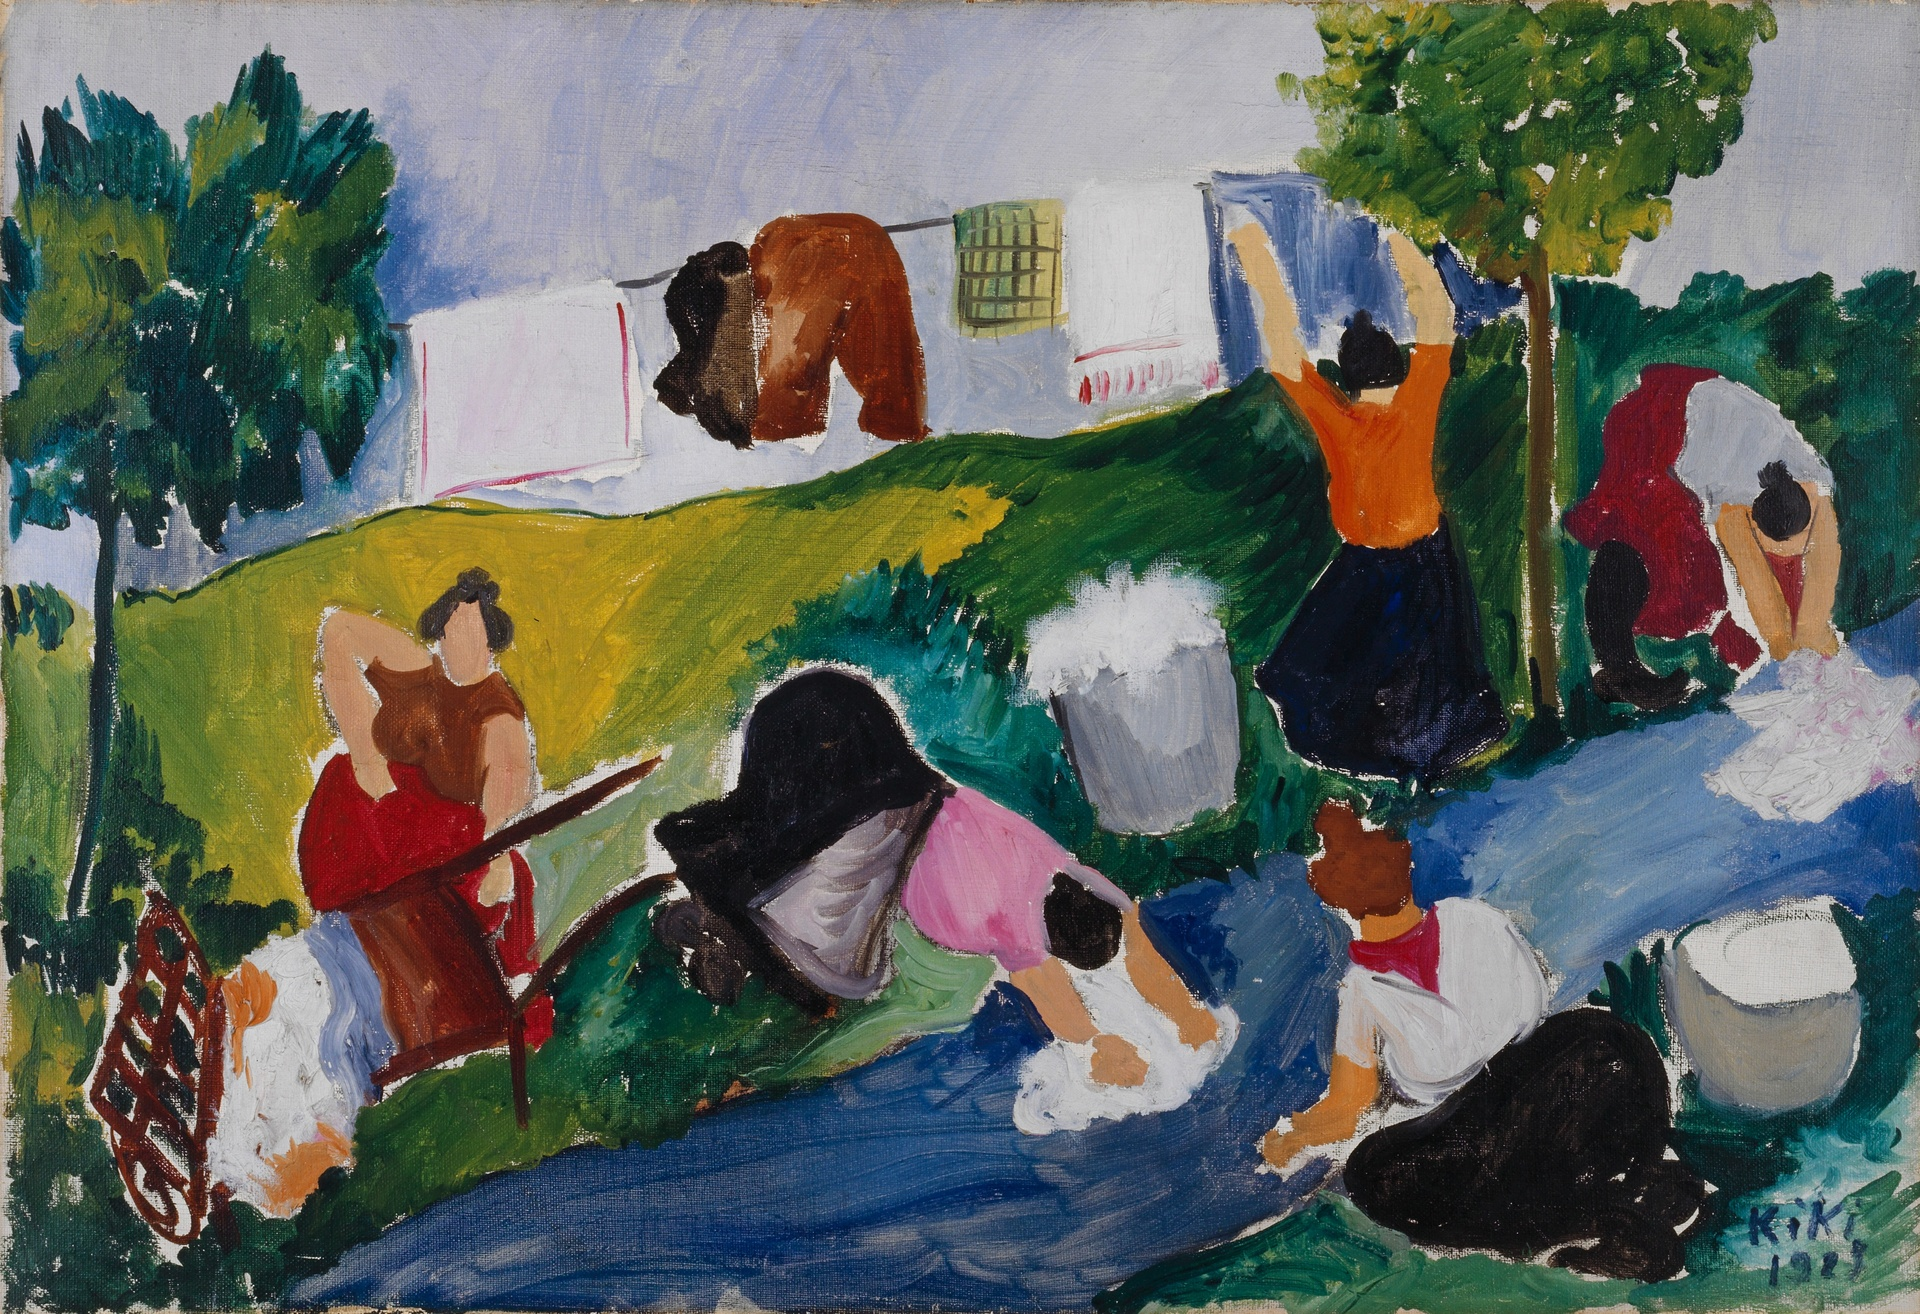 Kiki Montparnasse (Alice Ernestine Prin), Les lavandières, 1927, Öl und Bleistift auf Leinwand, Kunstmuseum Basel- Stiftung Im Obersteg, Depositum im Kunstmuseum Basel